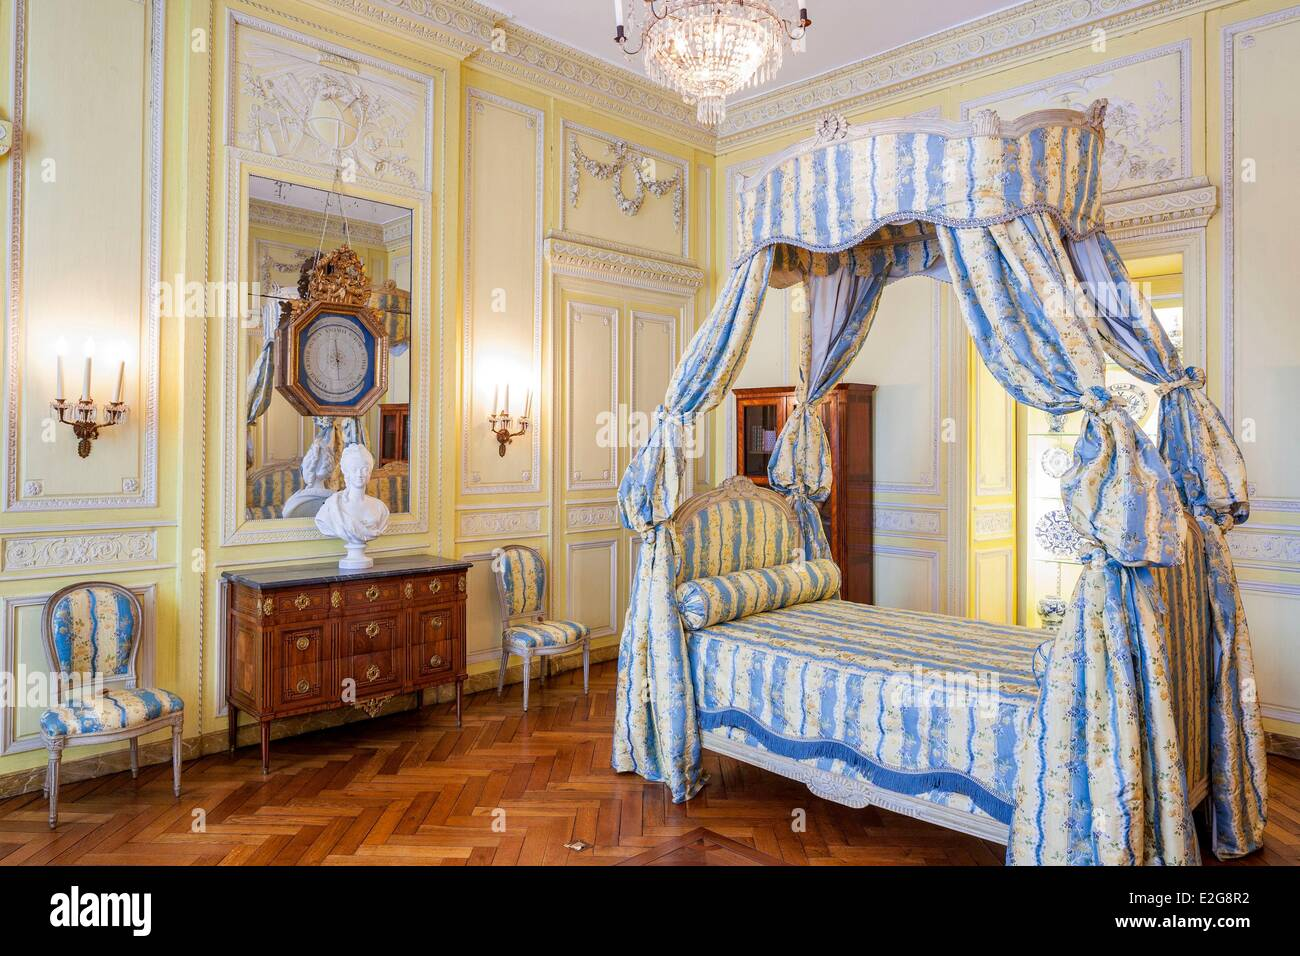 Camera Letto Bordeaux : Camera da letto bordeaux scegli l arredamento per la tua camera